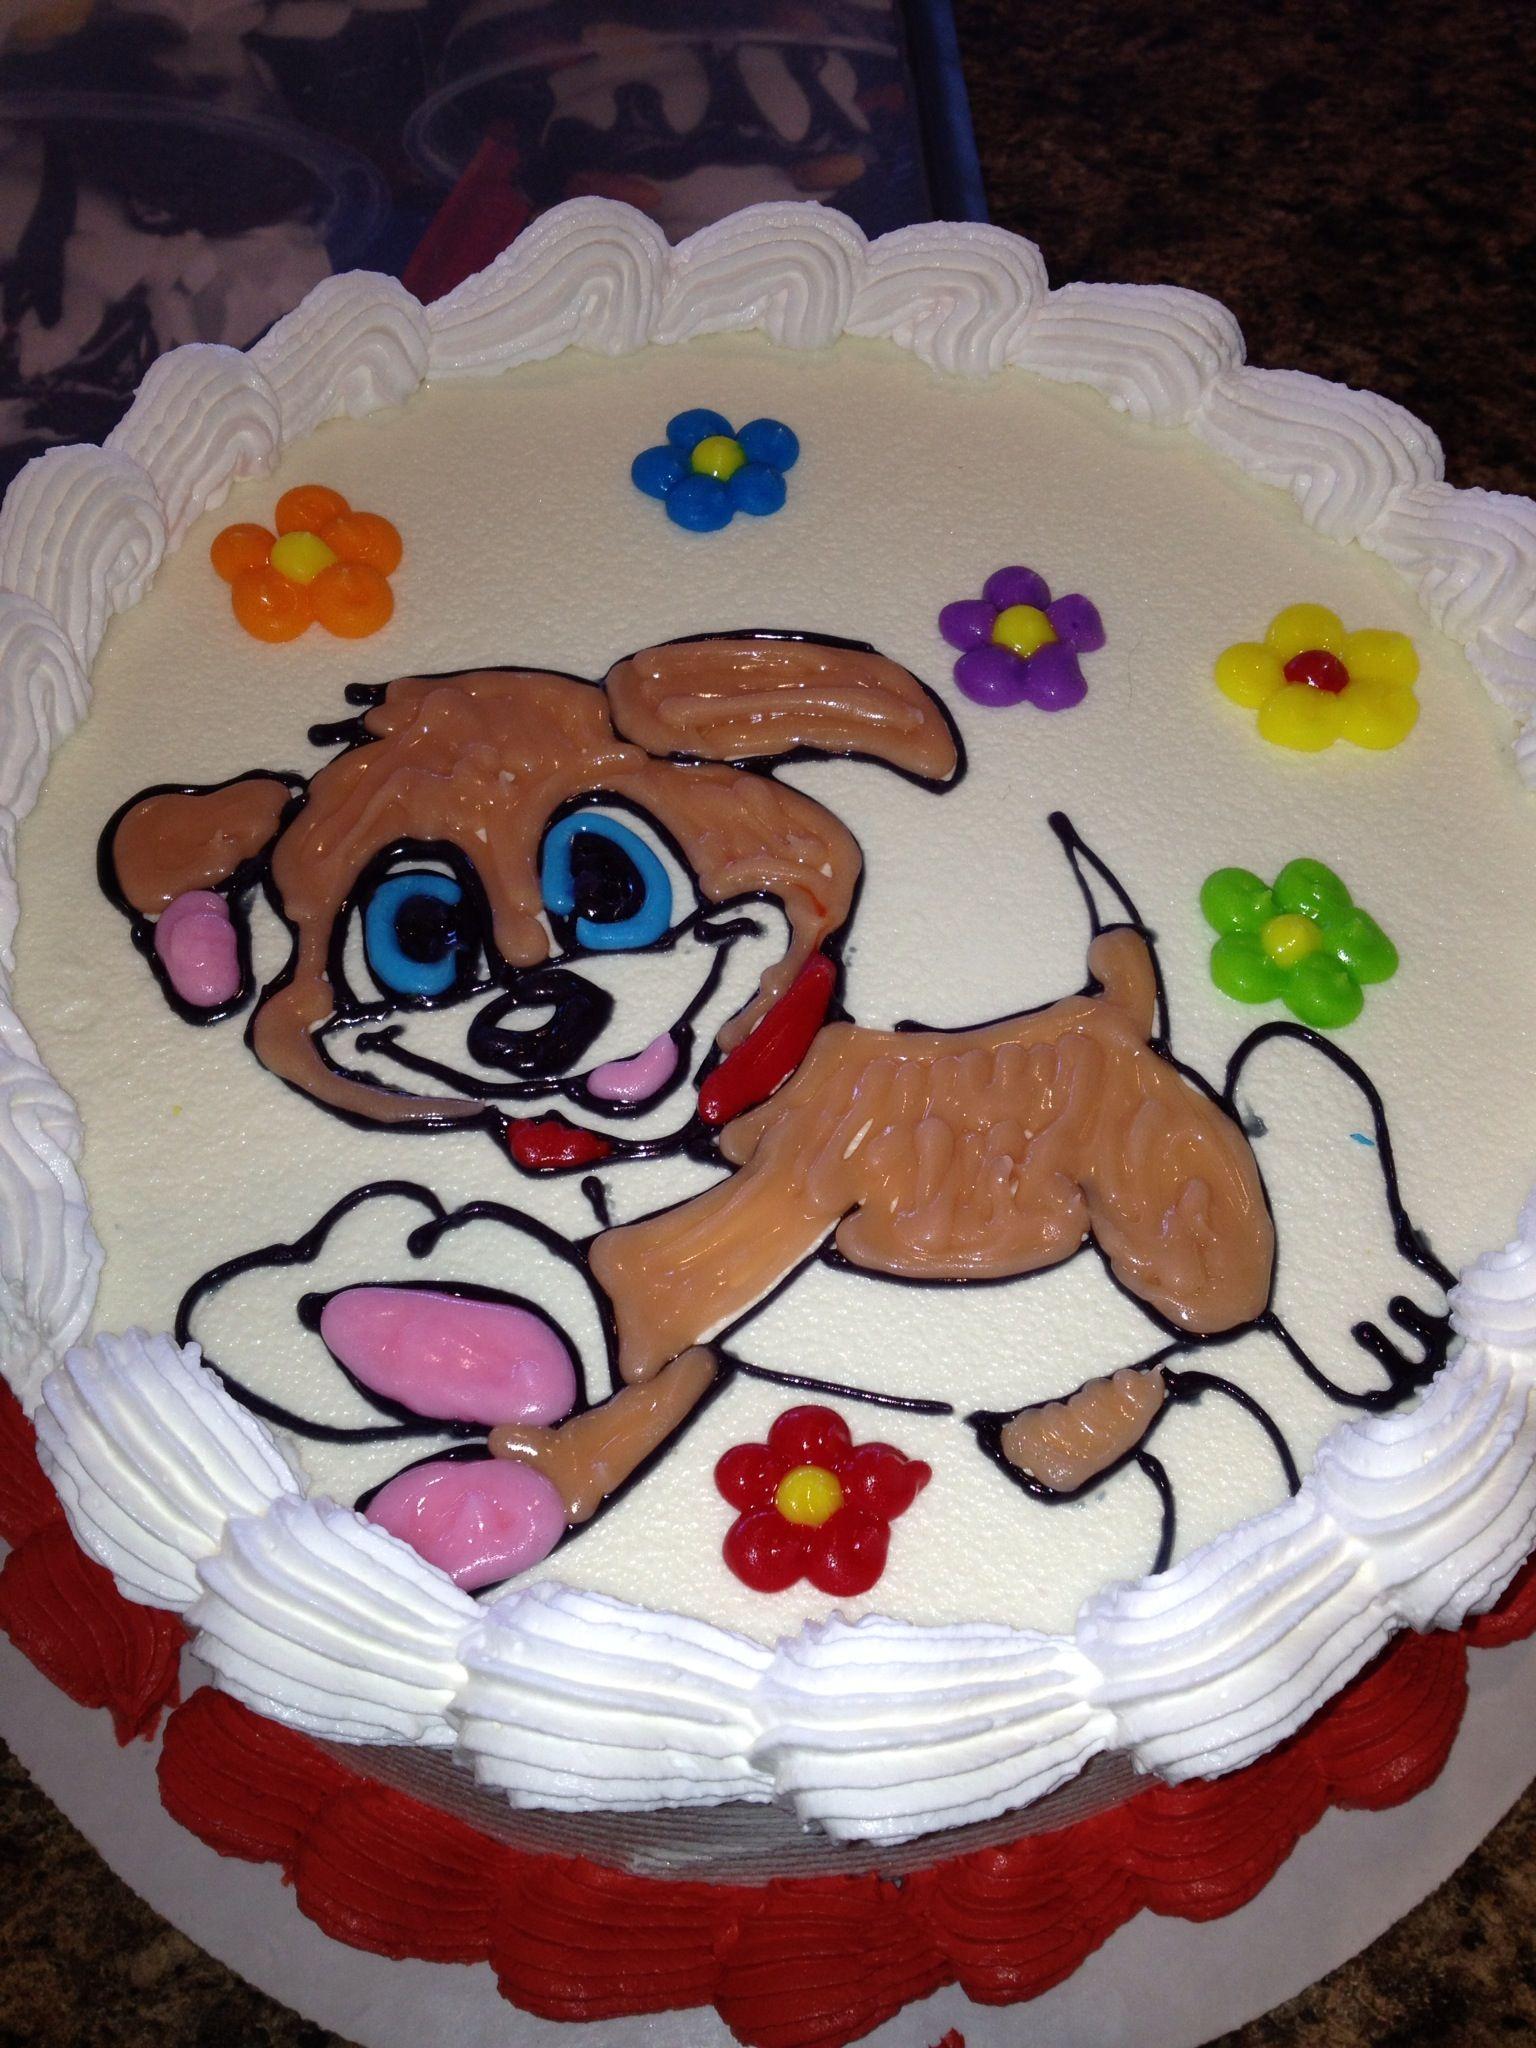 Dq Cakes Dairy Queen Cutest Little Puppy Ice Cream Cake